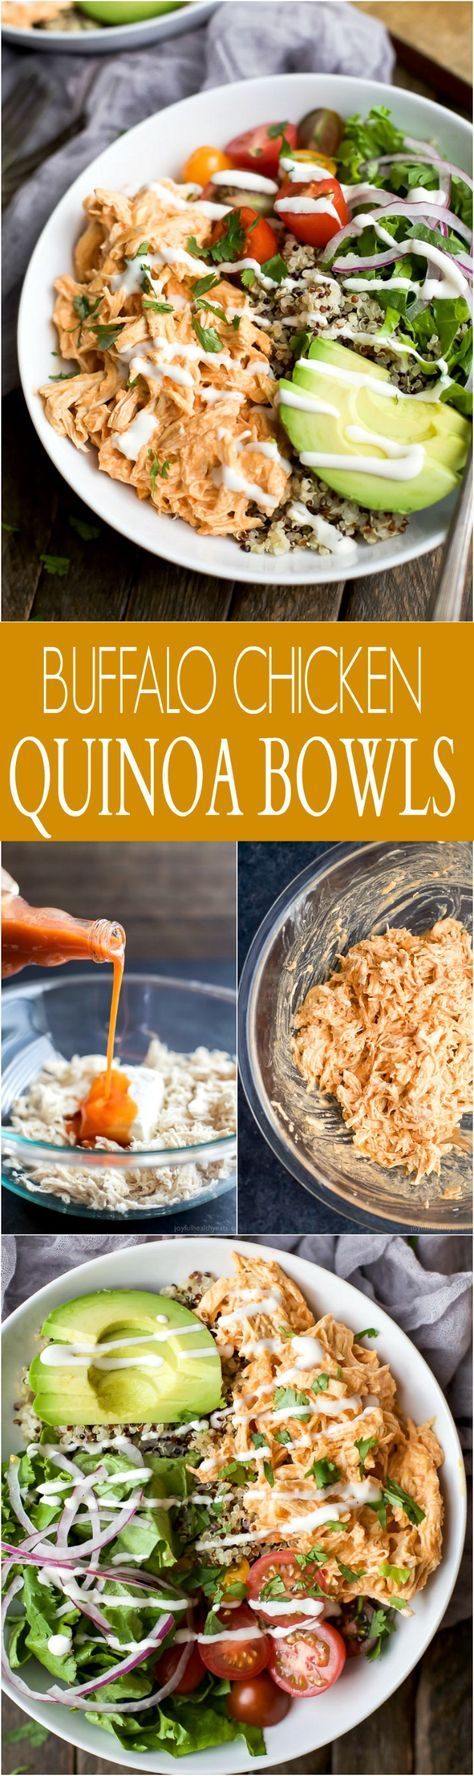 Buffalo Chicken Quinoa Bowls | Easy Buffalo Chicken Dinner Recipe